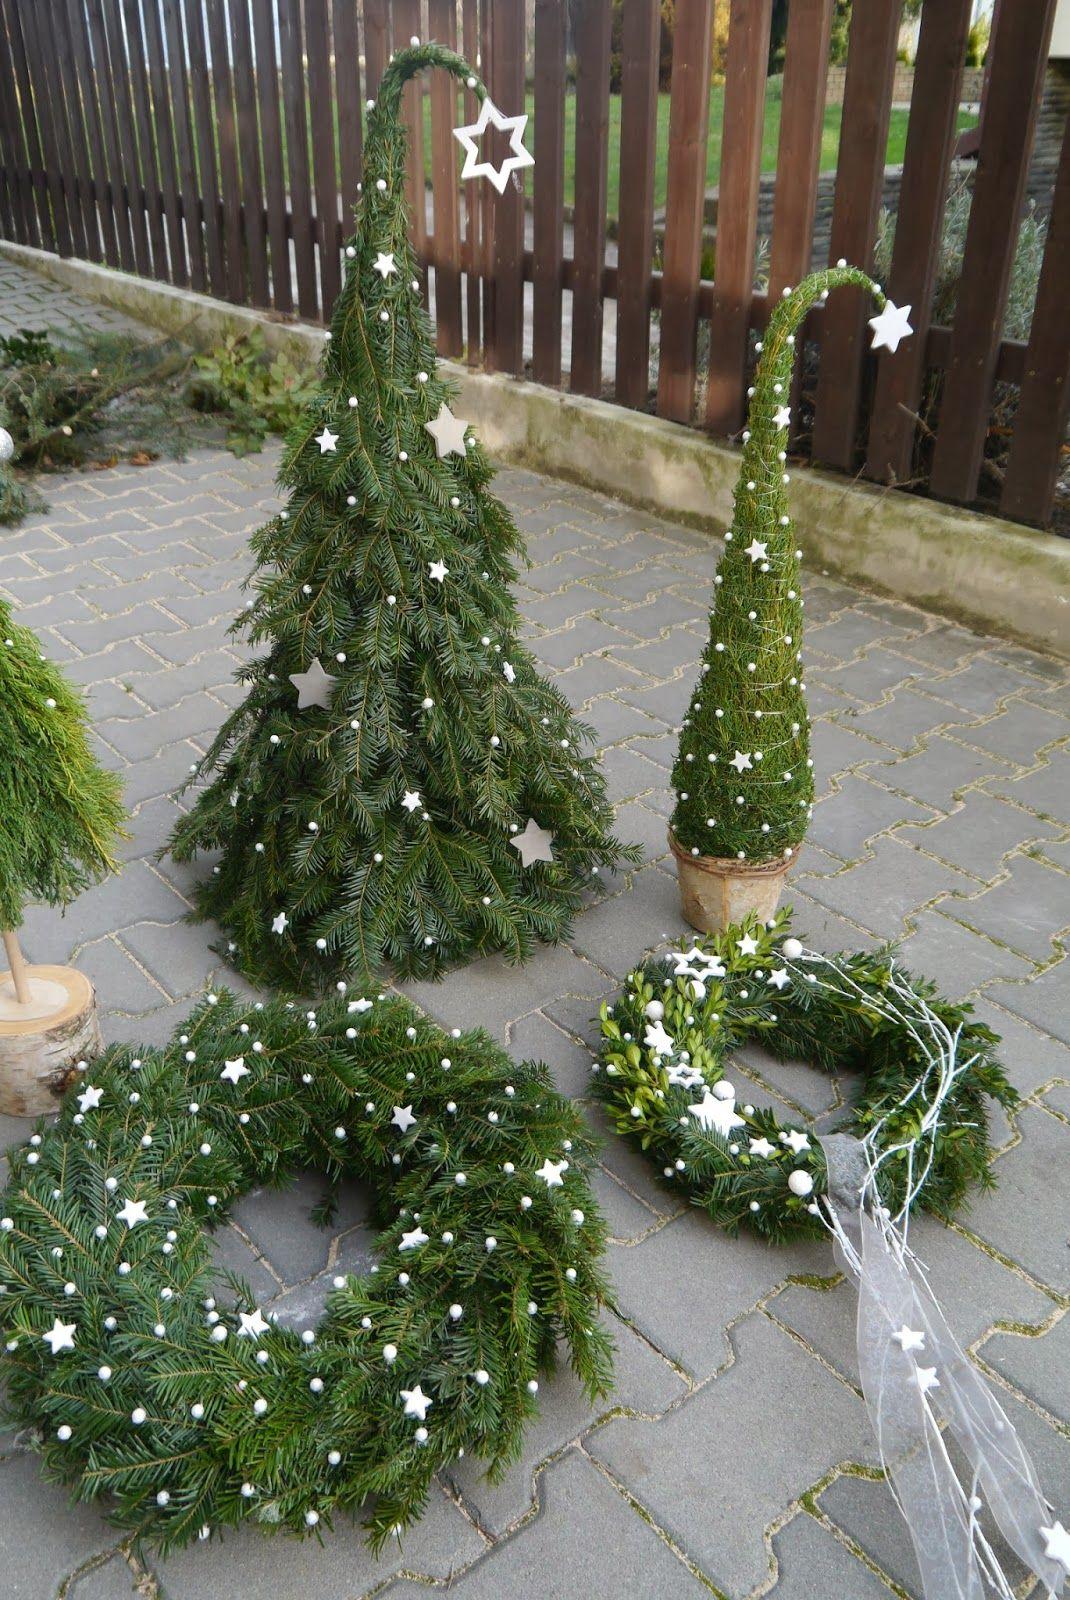 Zdravim Vsechny Na Blogu A Dekuji Za Radky Ktere Zde Zanechavate Prosinec Je Hodne Narocny Christmas Tree Decorations Diy Diy Christmas Tree Christmas Wreaths